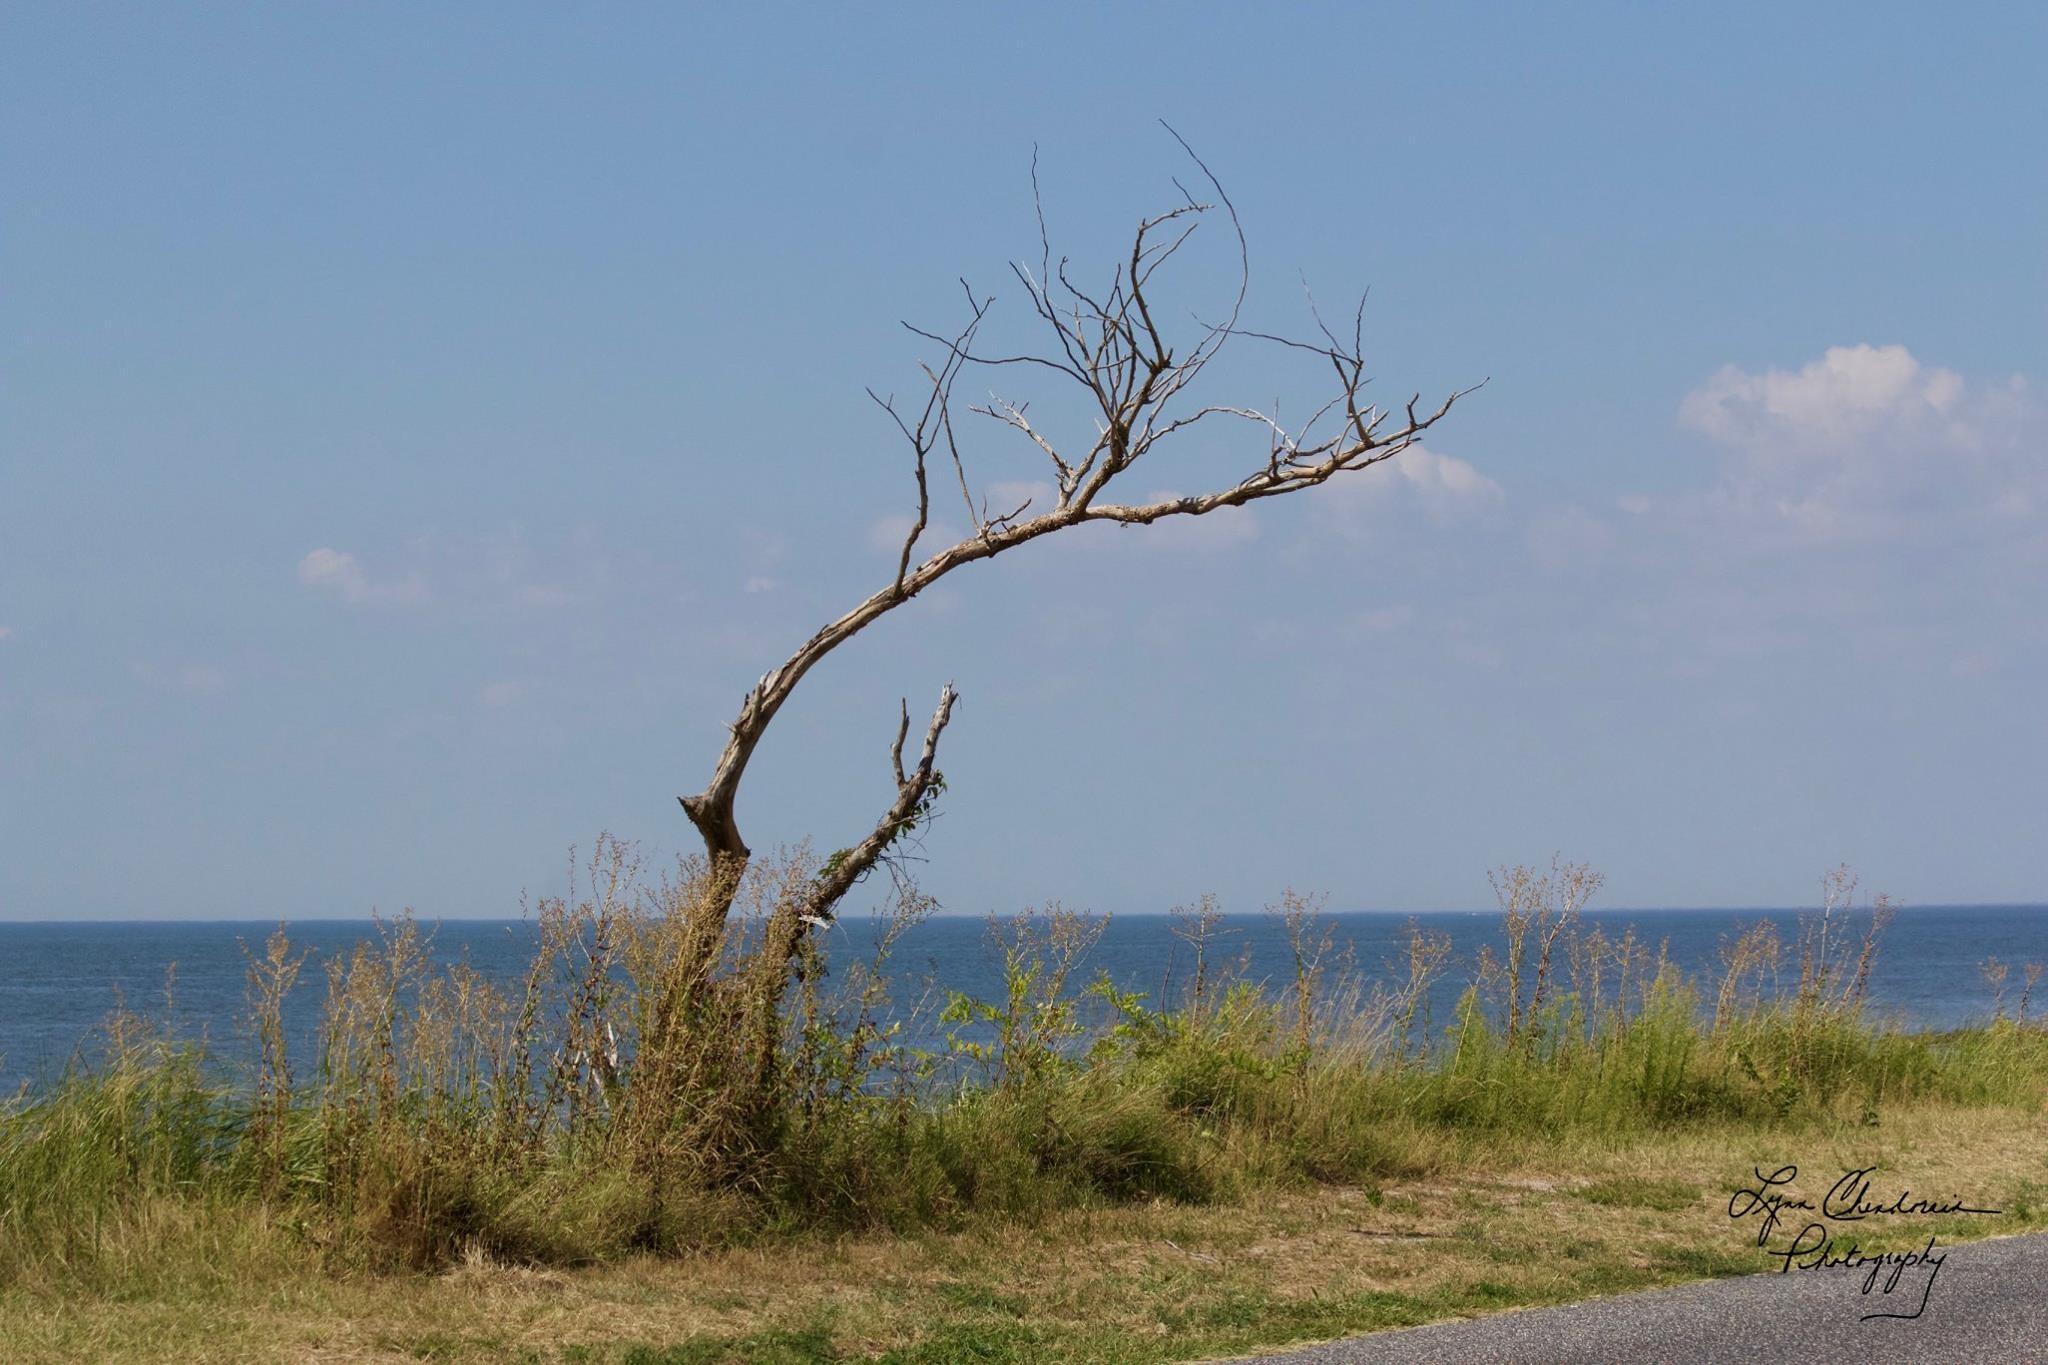 The Tree at the Bay by Lynn Chendorain